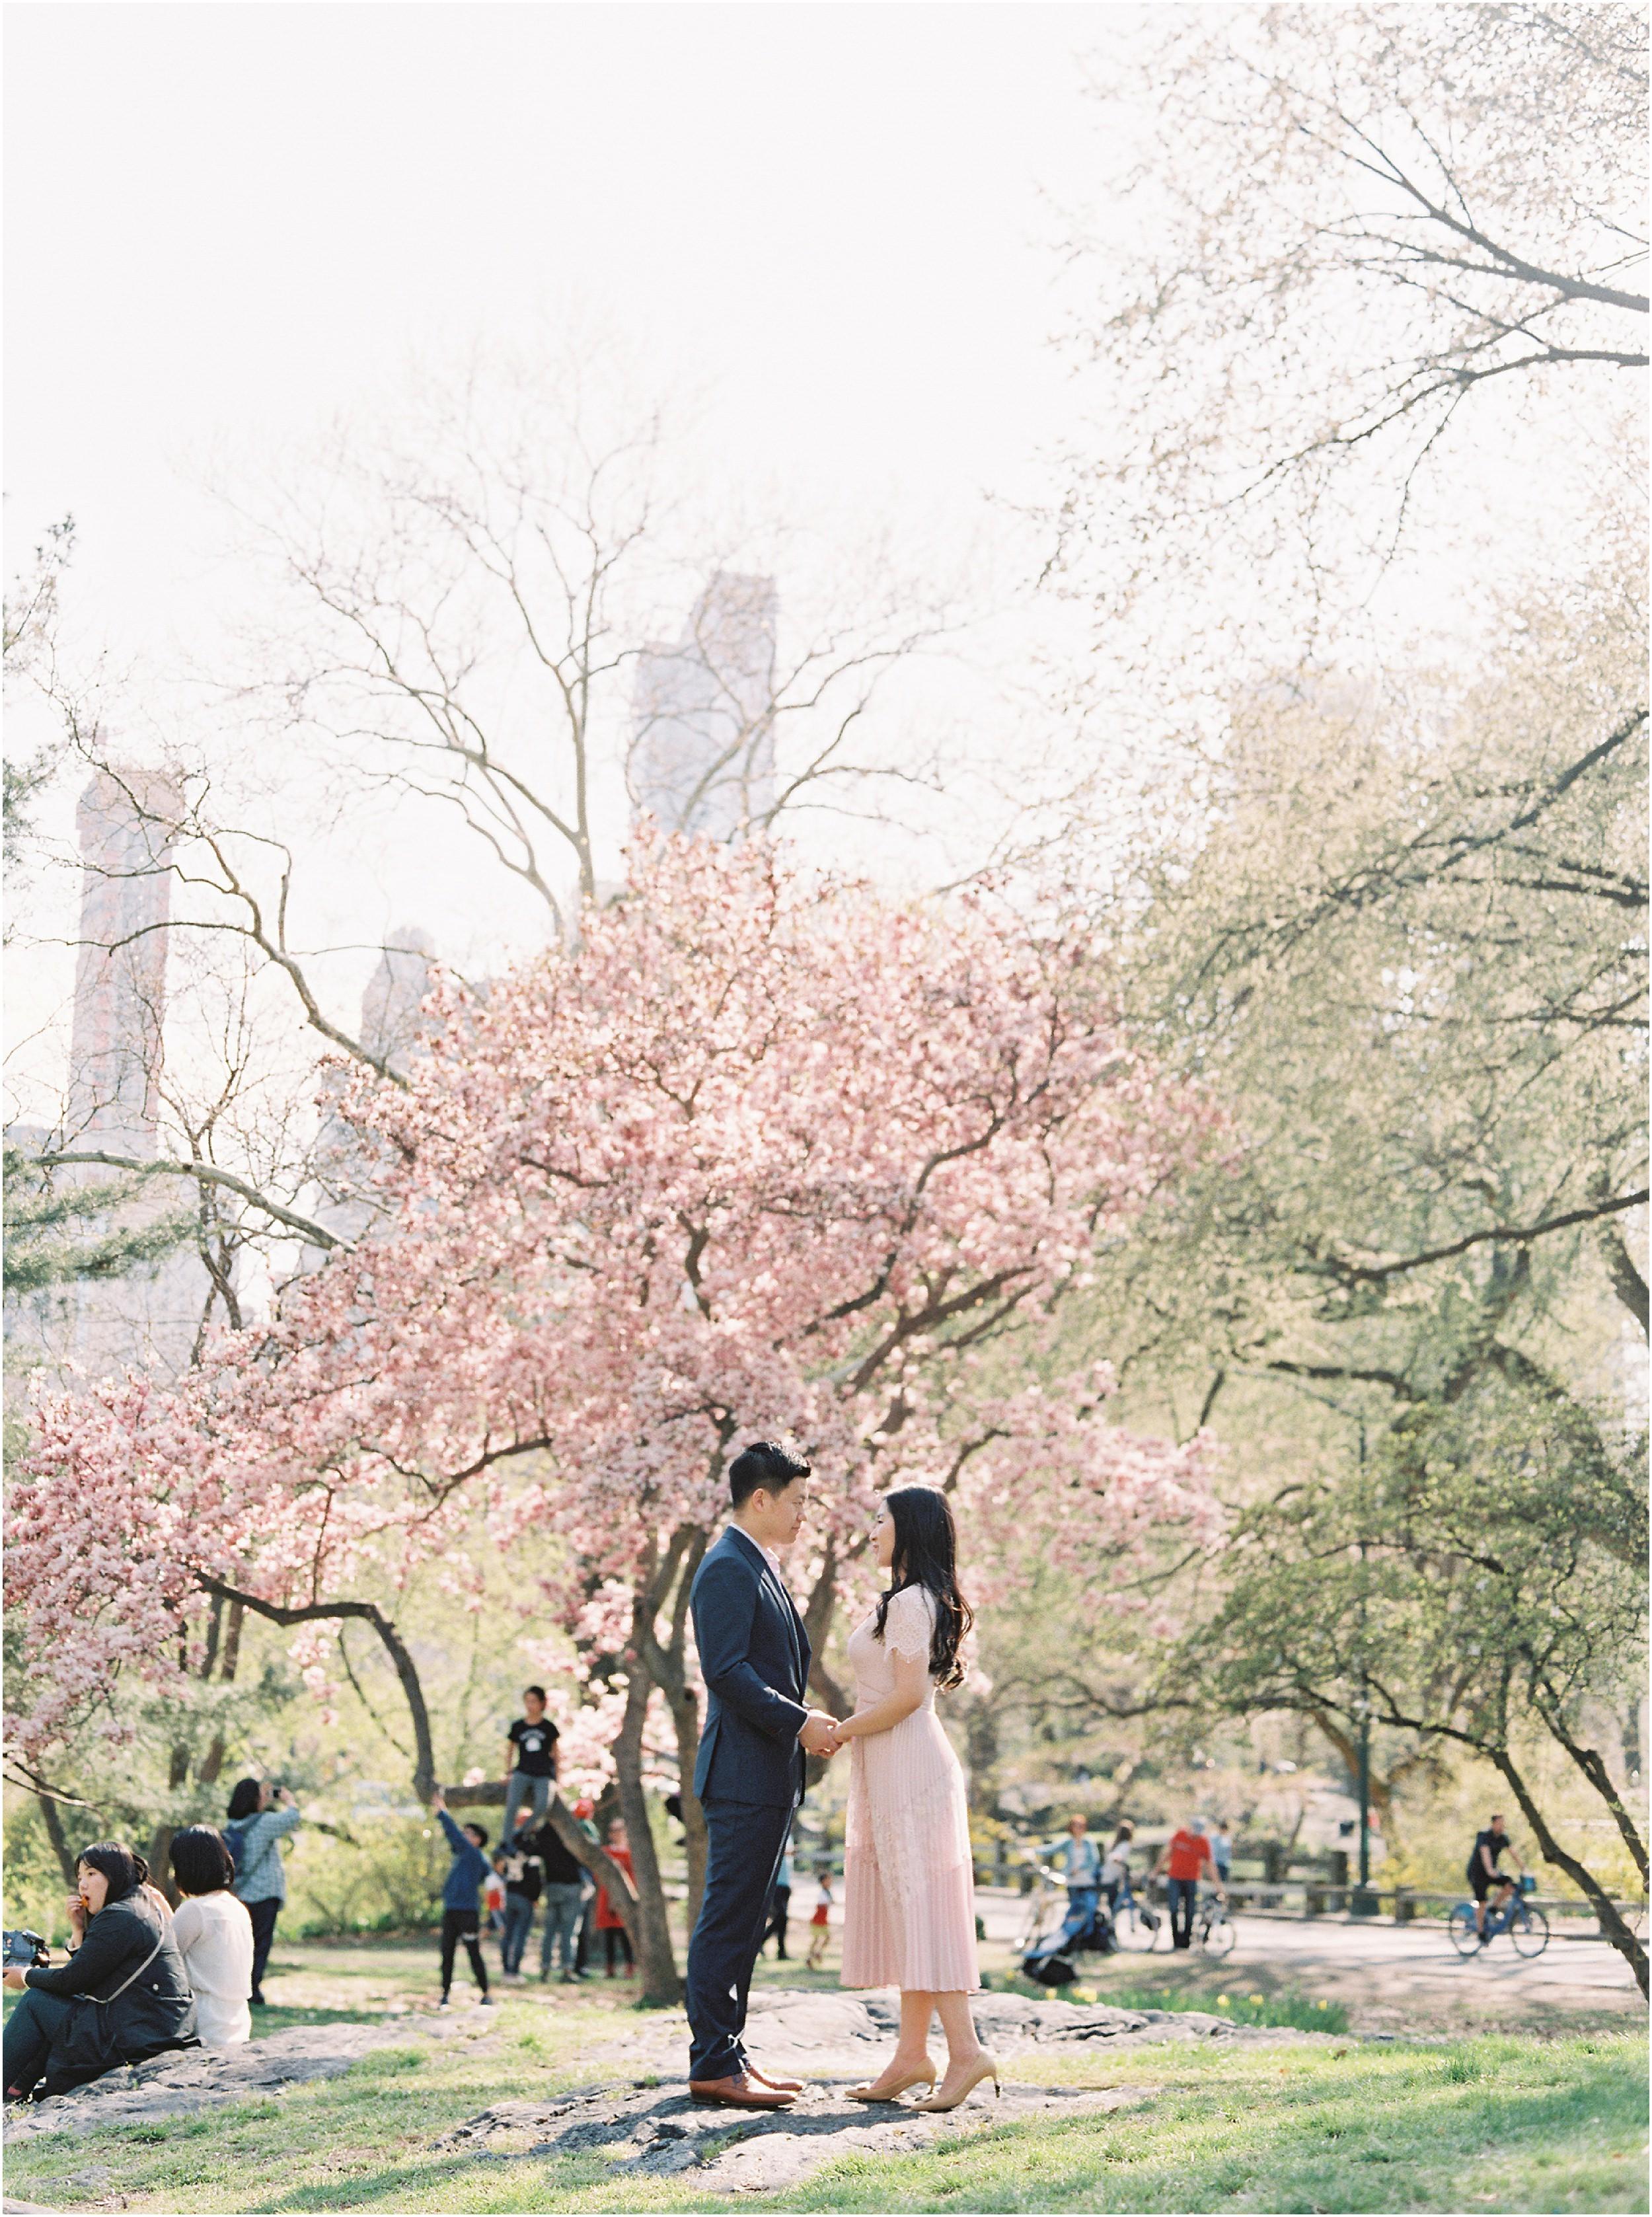 JeremiahRachelPhotography_CentralPark_NYC_SpringtimeBloom_EngagementSession0018.JPG